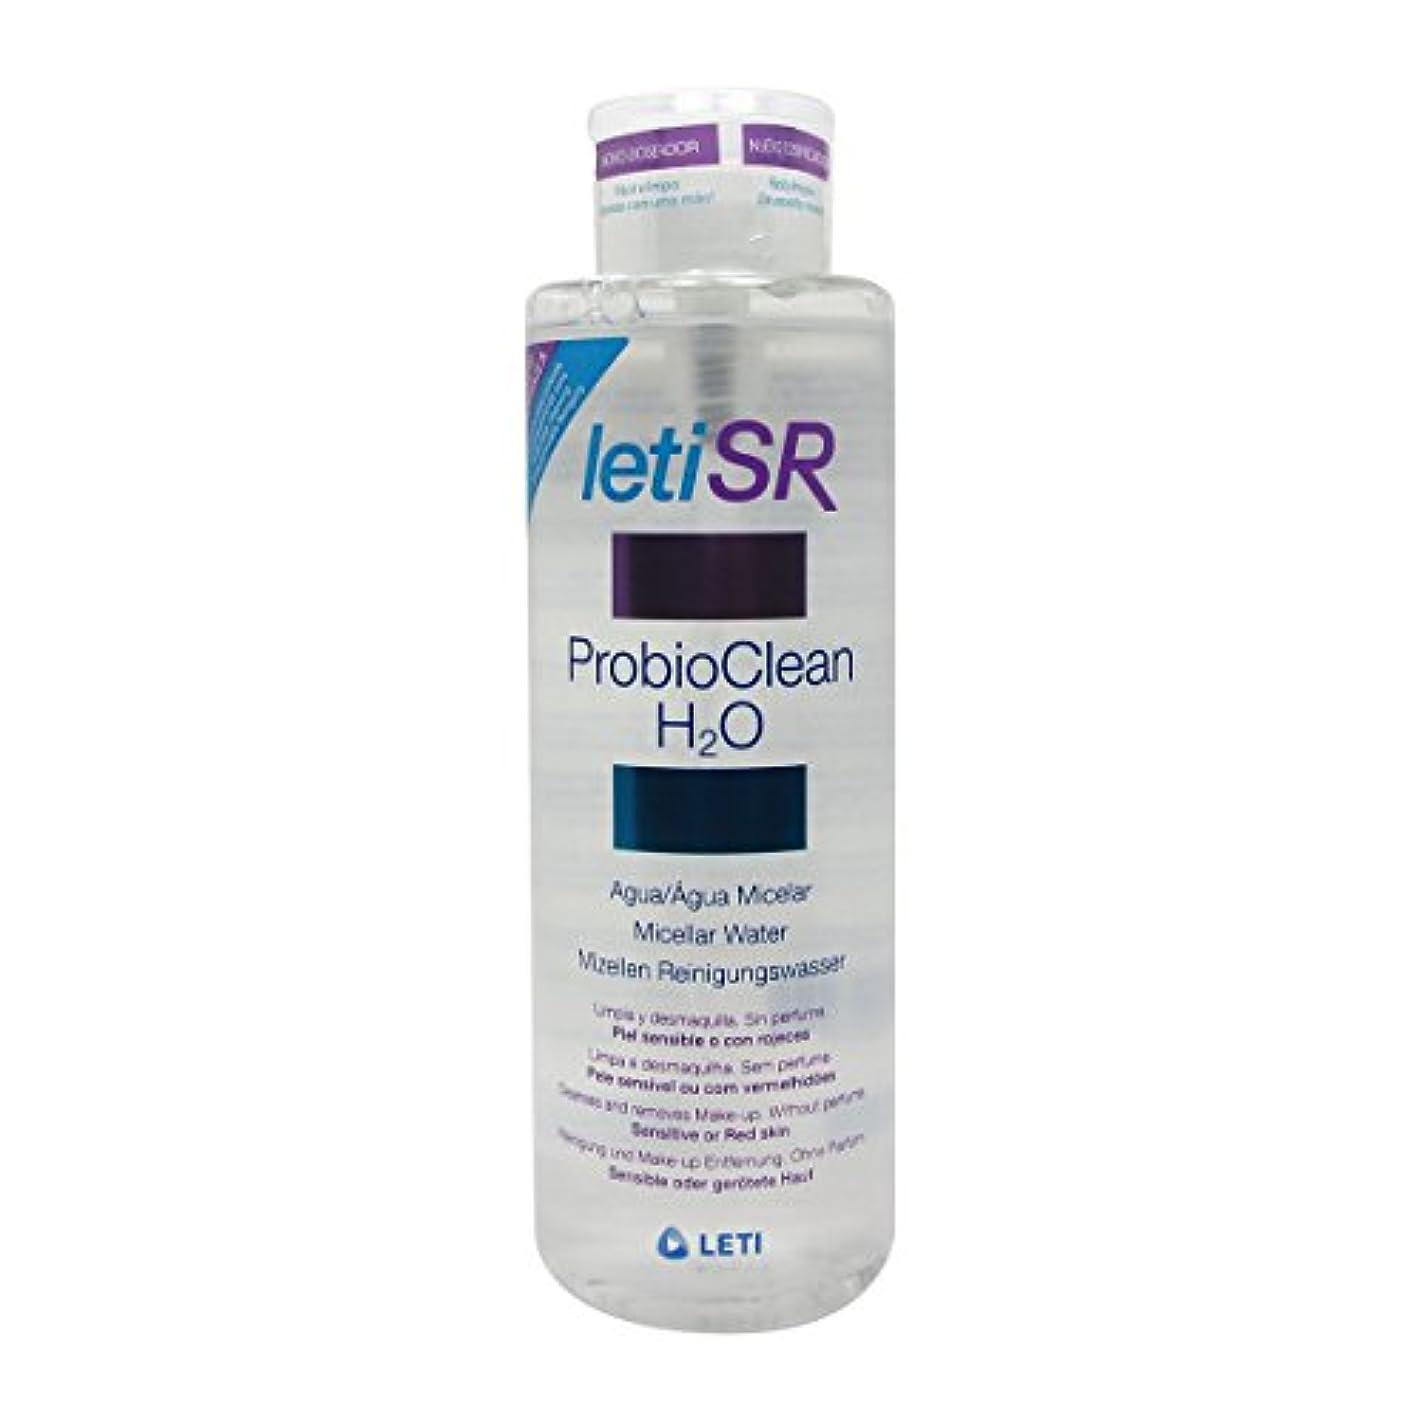 剣鎮痛剤局Leti Sr Probioclean H2o Micellar Water 500ml [並行輸入品]